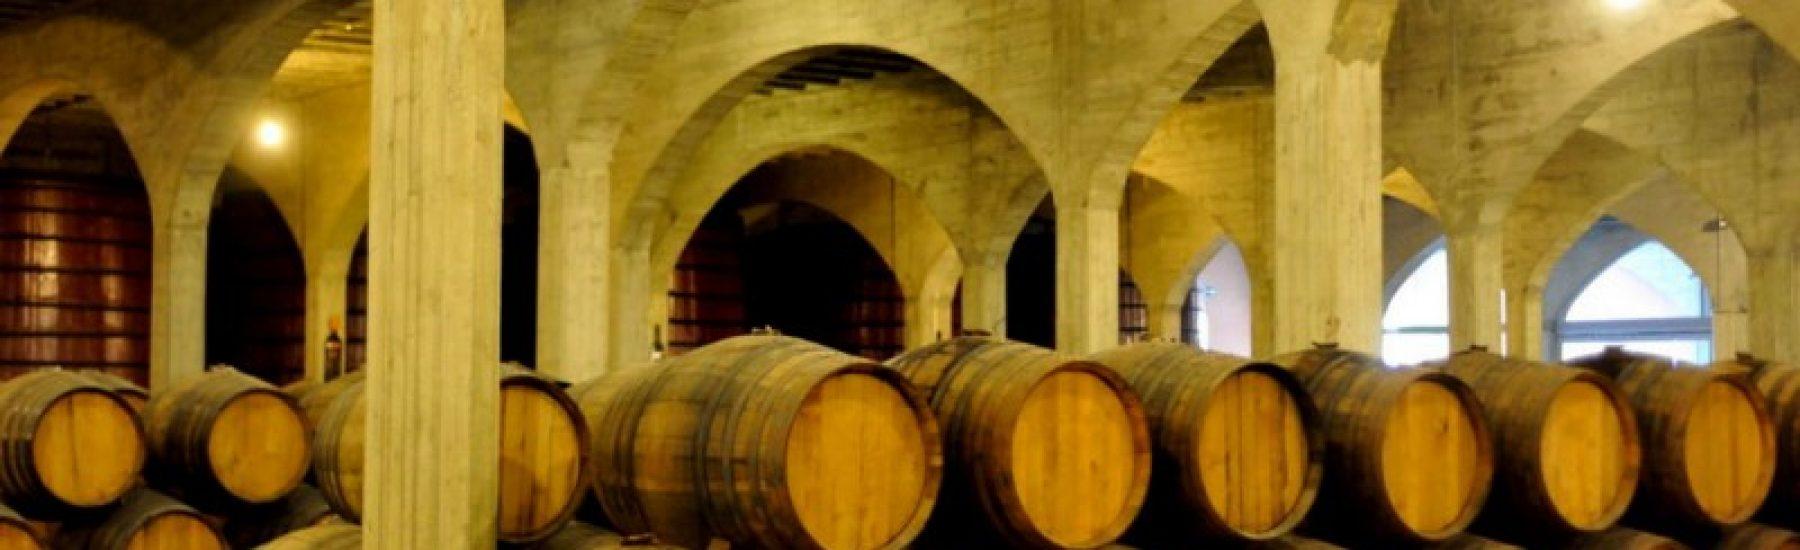 33163_jumilla-wine-route-bodegas-san-isidro_41483729907_large